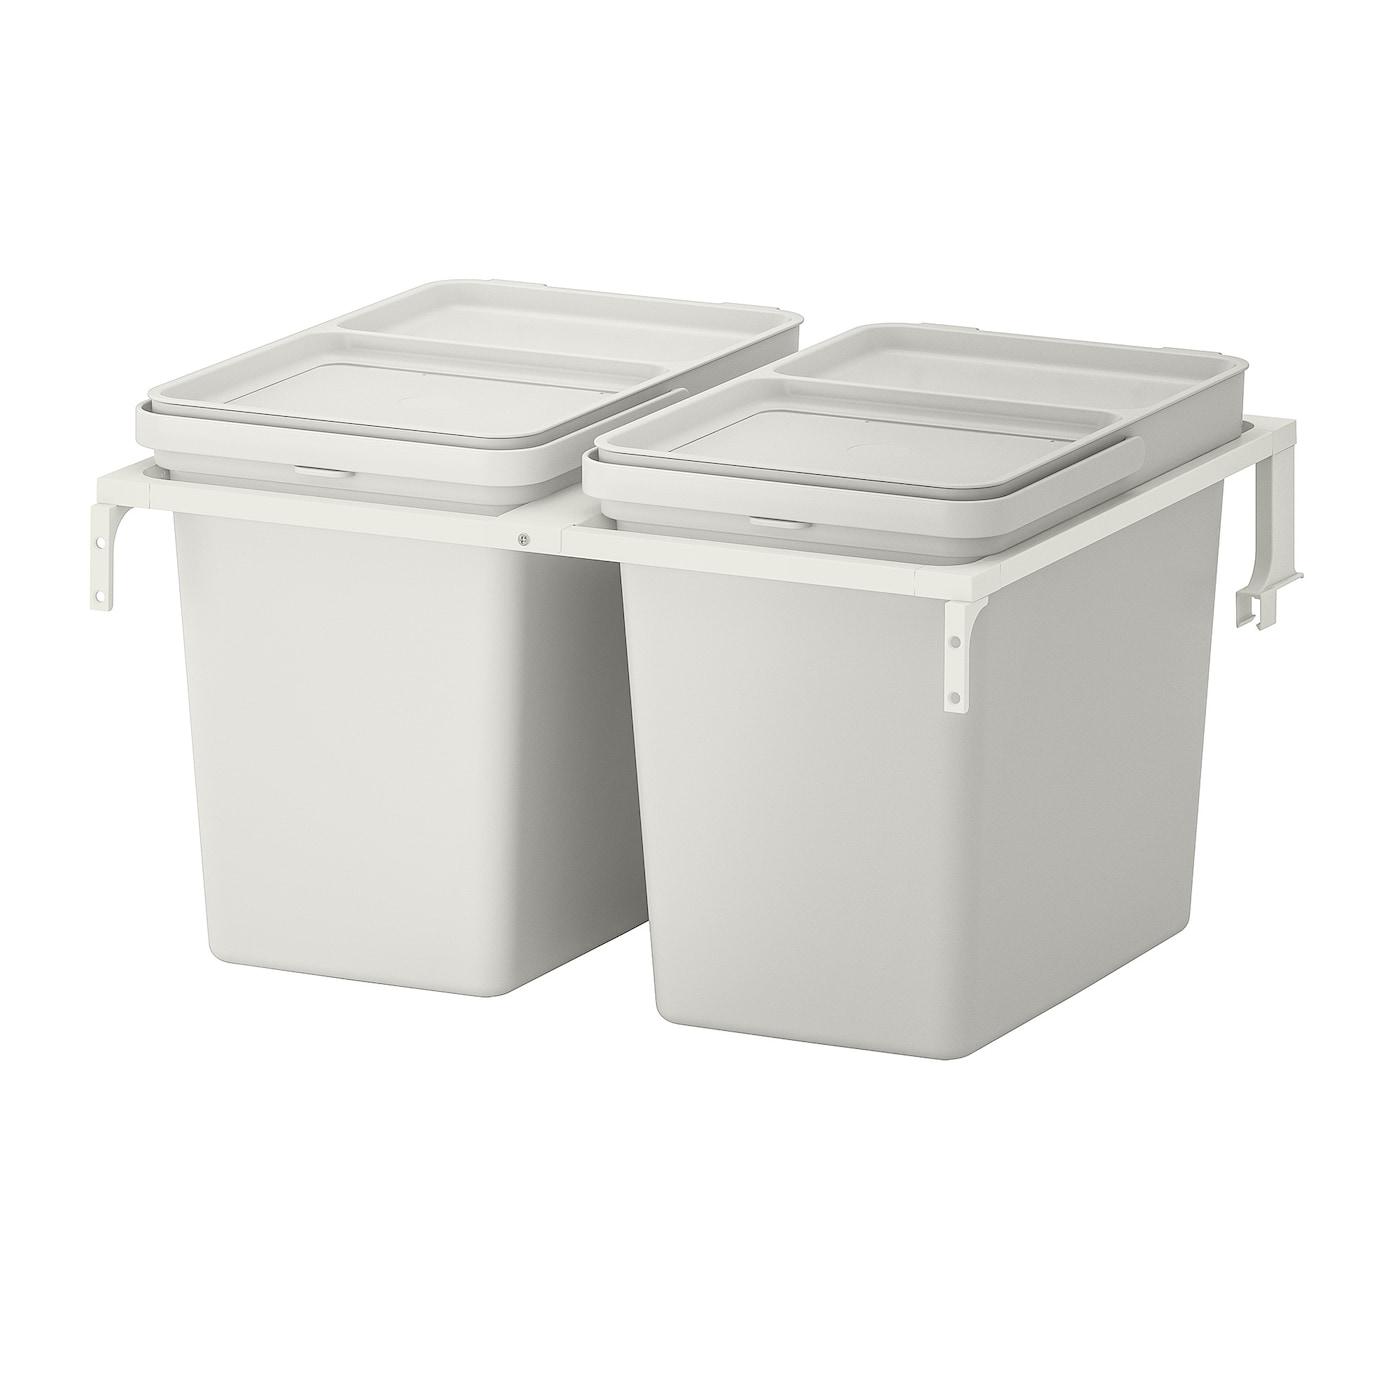 https://www.ikea.com/fr/fr/images/products/hallbar-waste-sorting-solution-for-metod-kitchen-drawer-light-grey__0761376_PE751241_S5.JPG